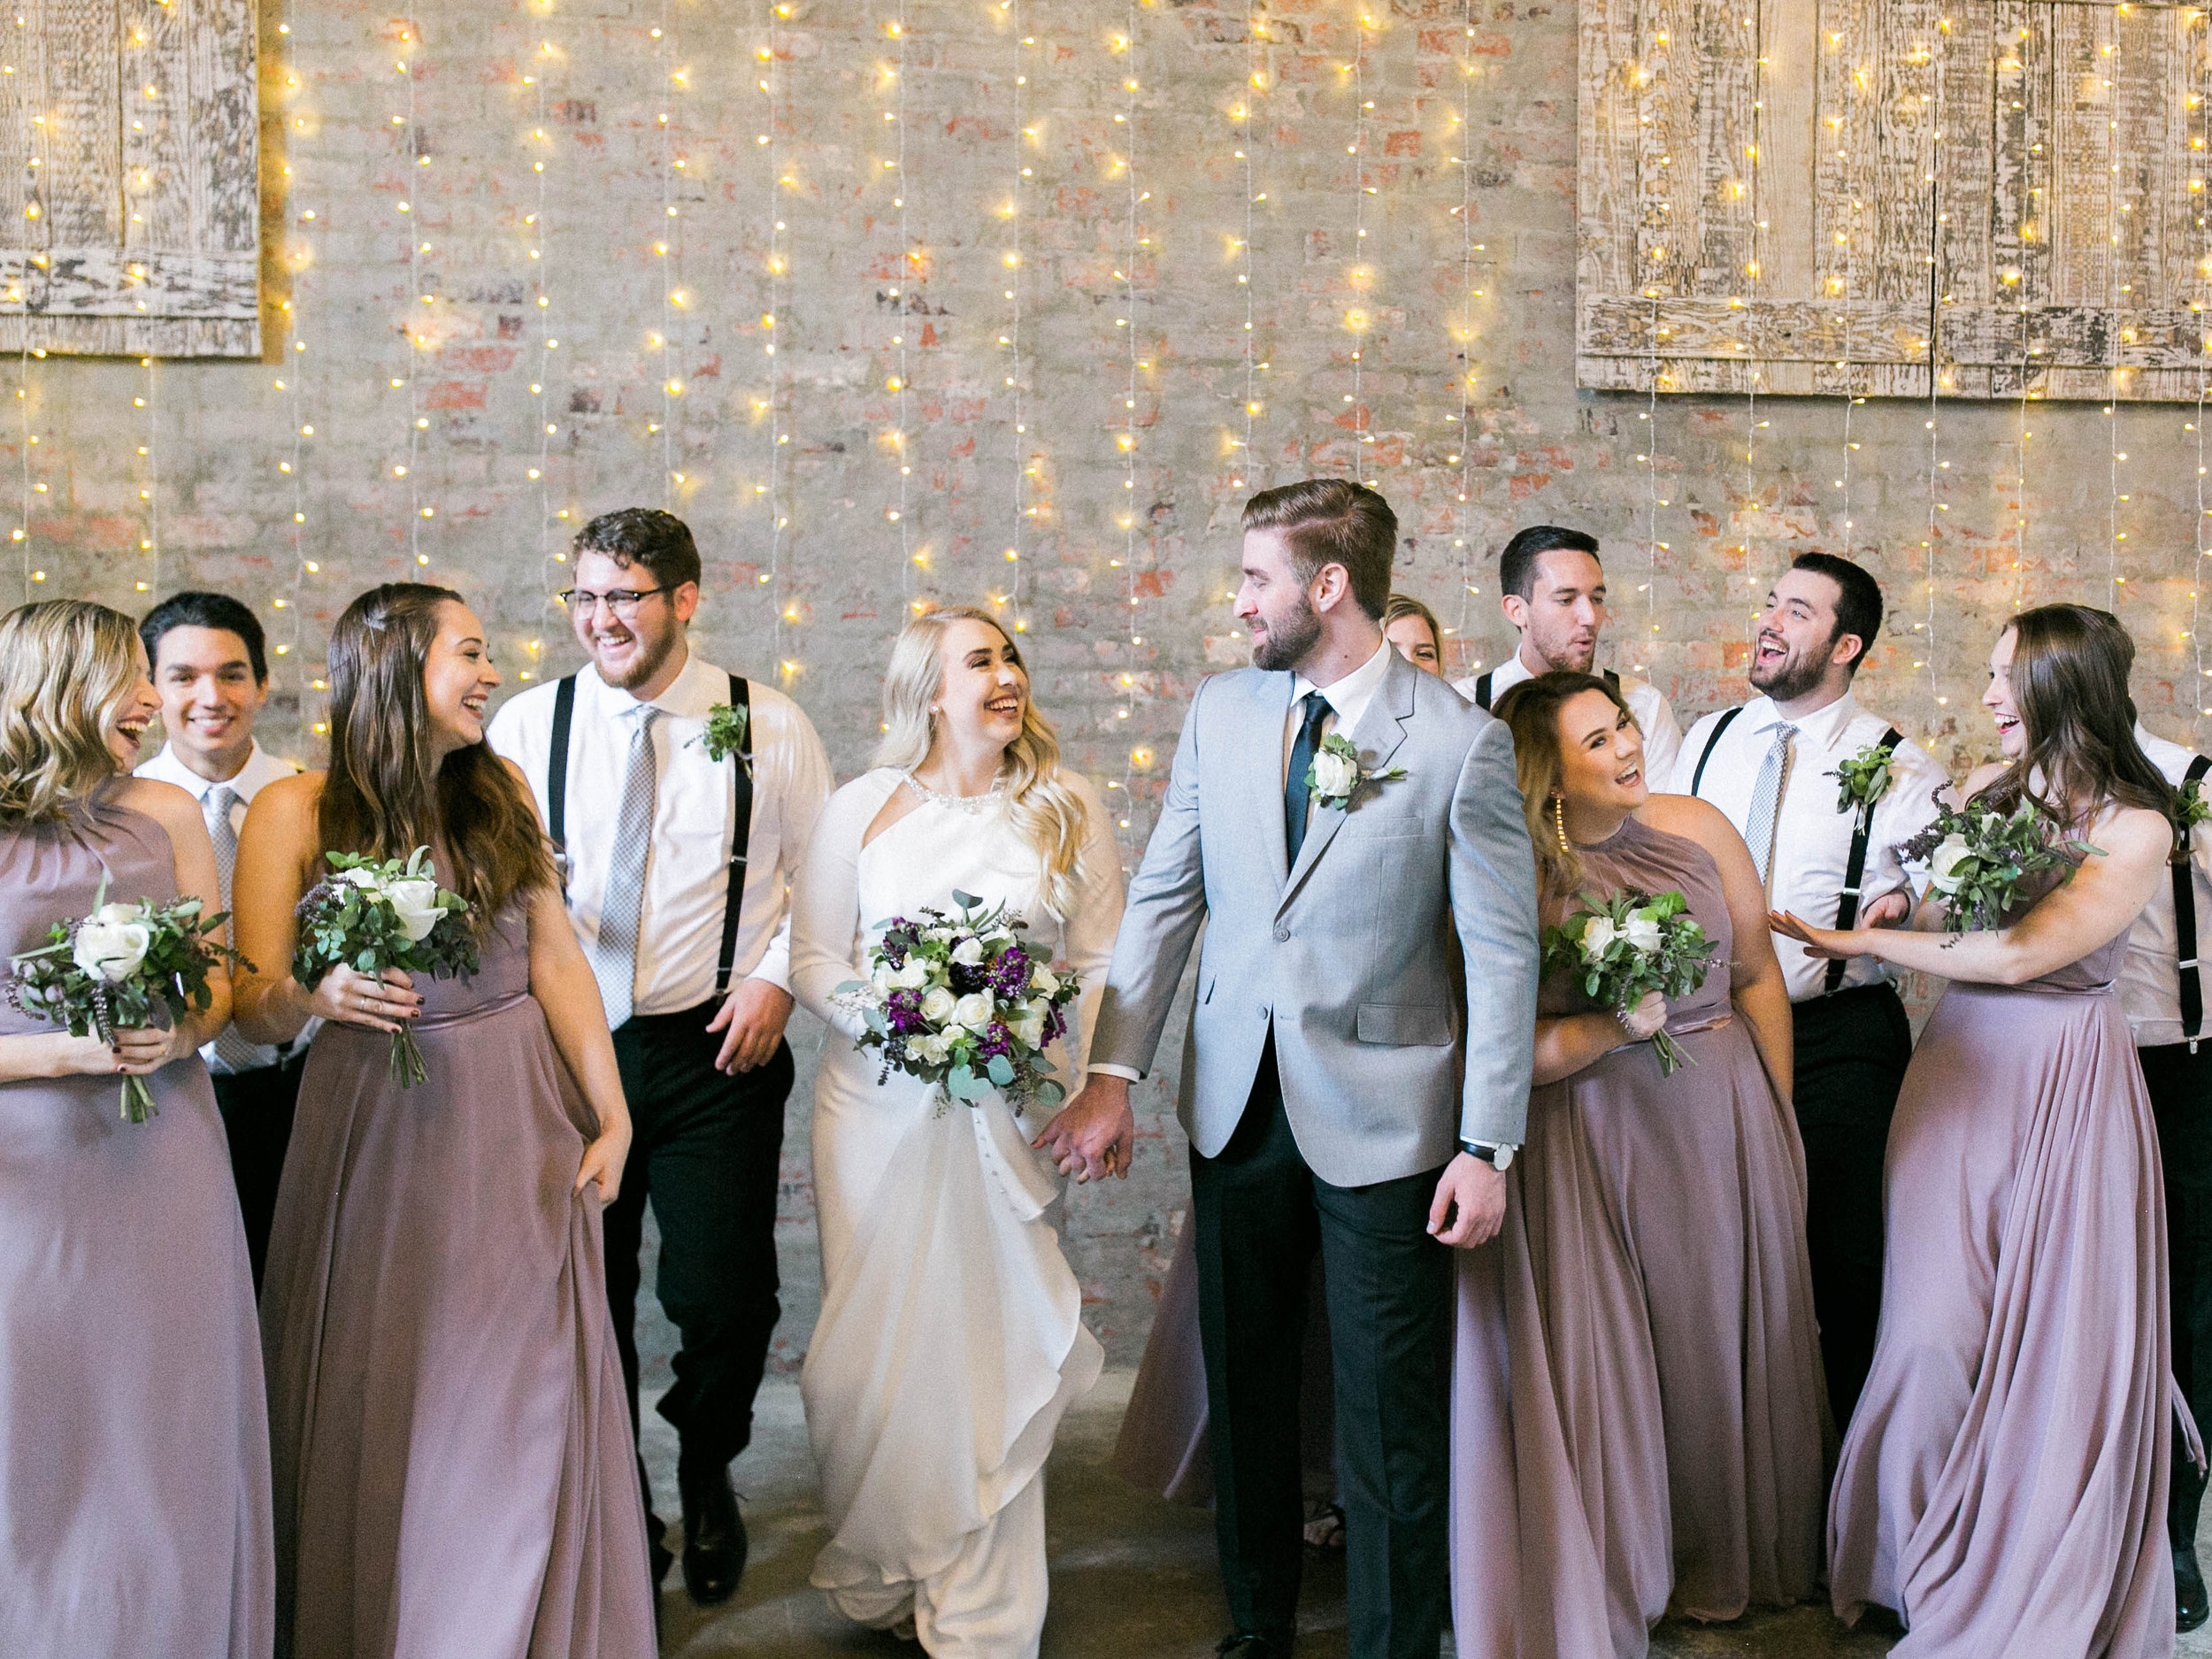 folkeswedding-246.jpg